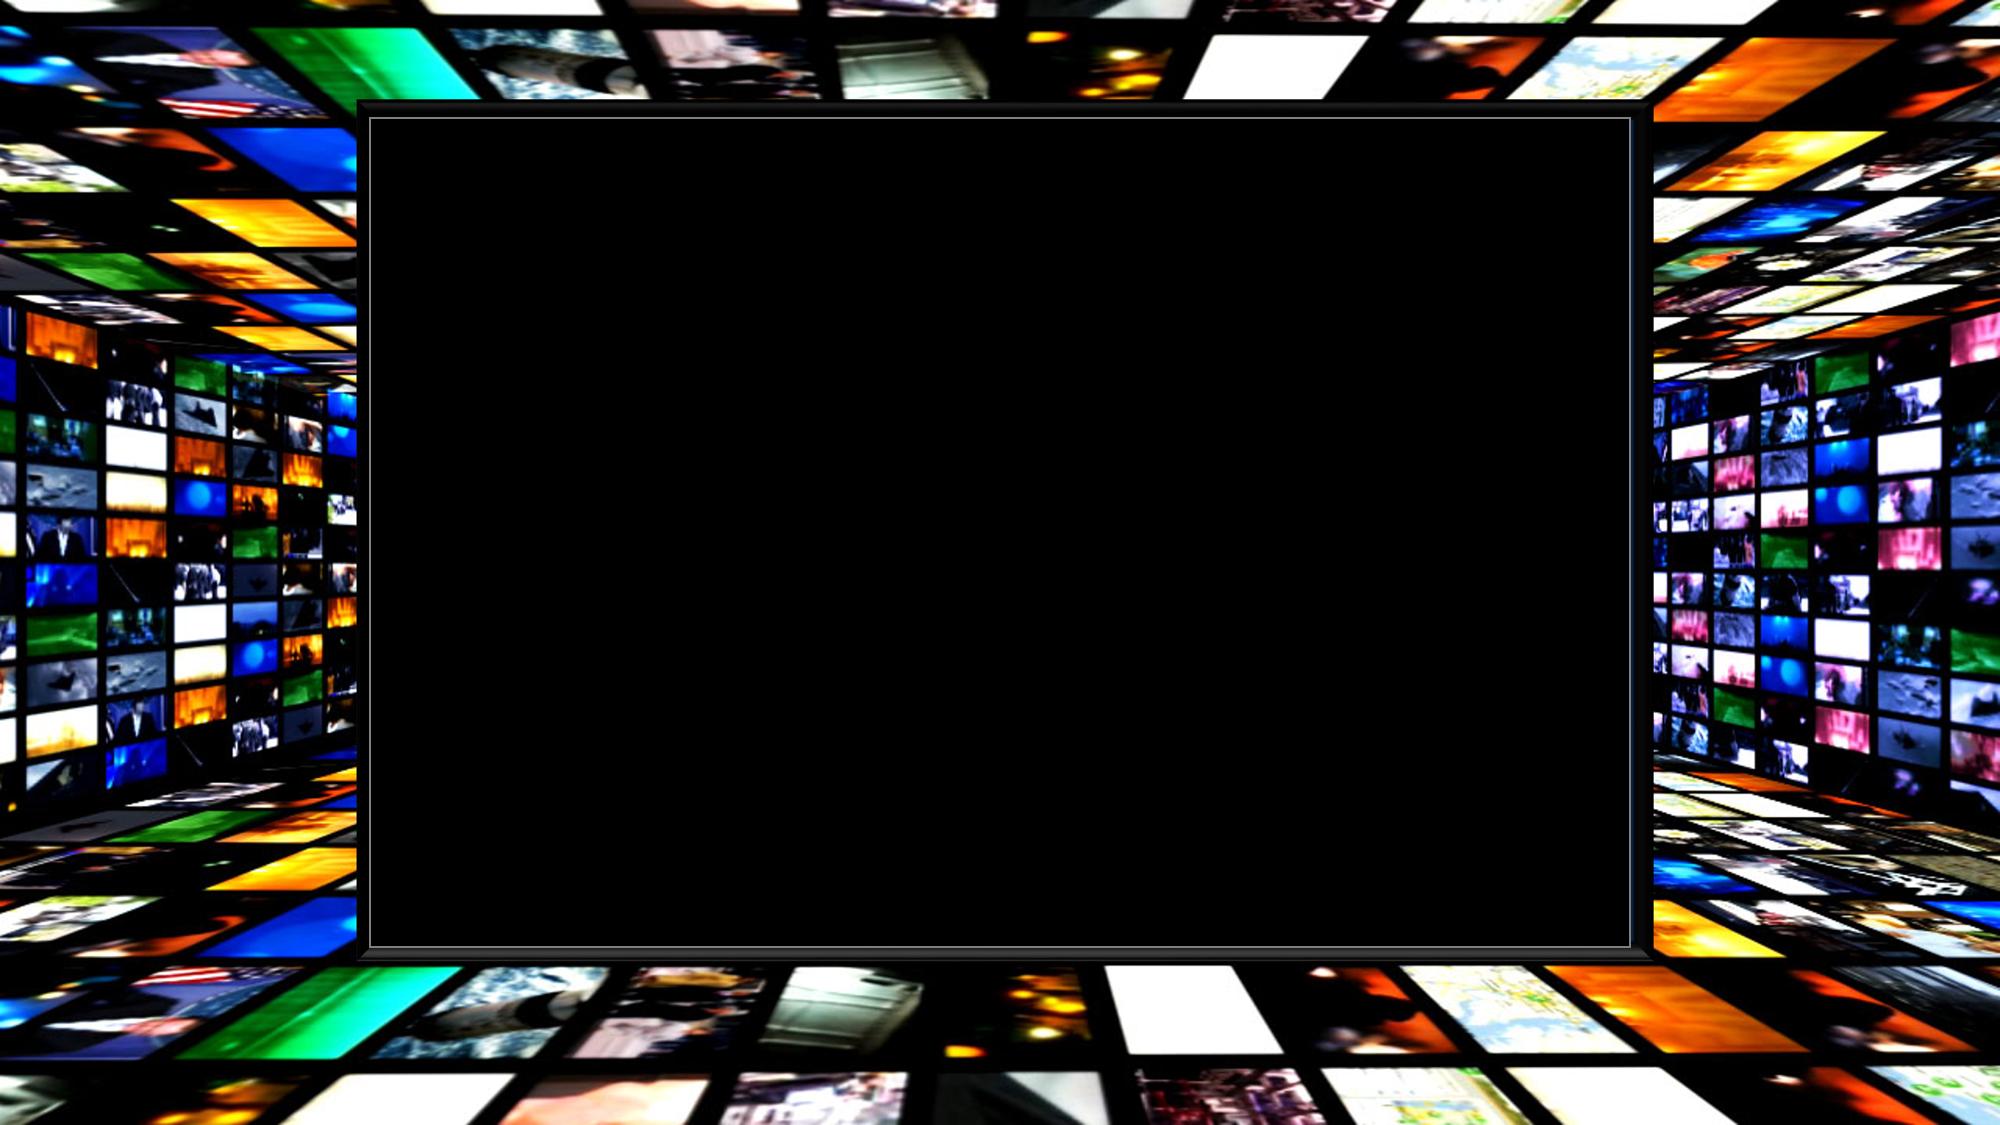 F - WEB TV